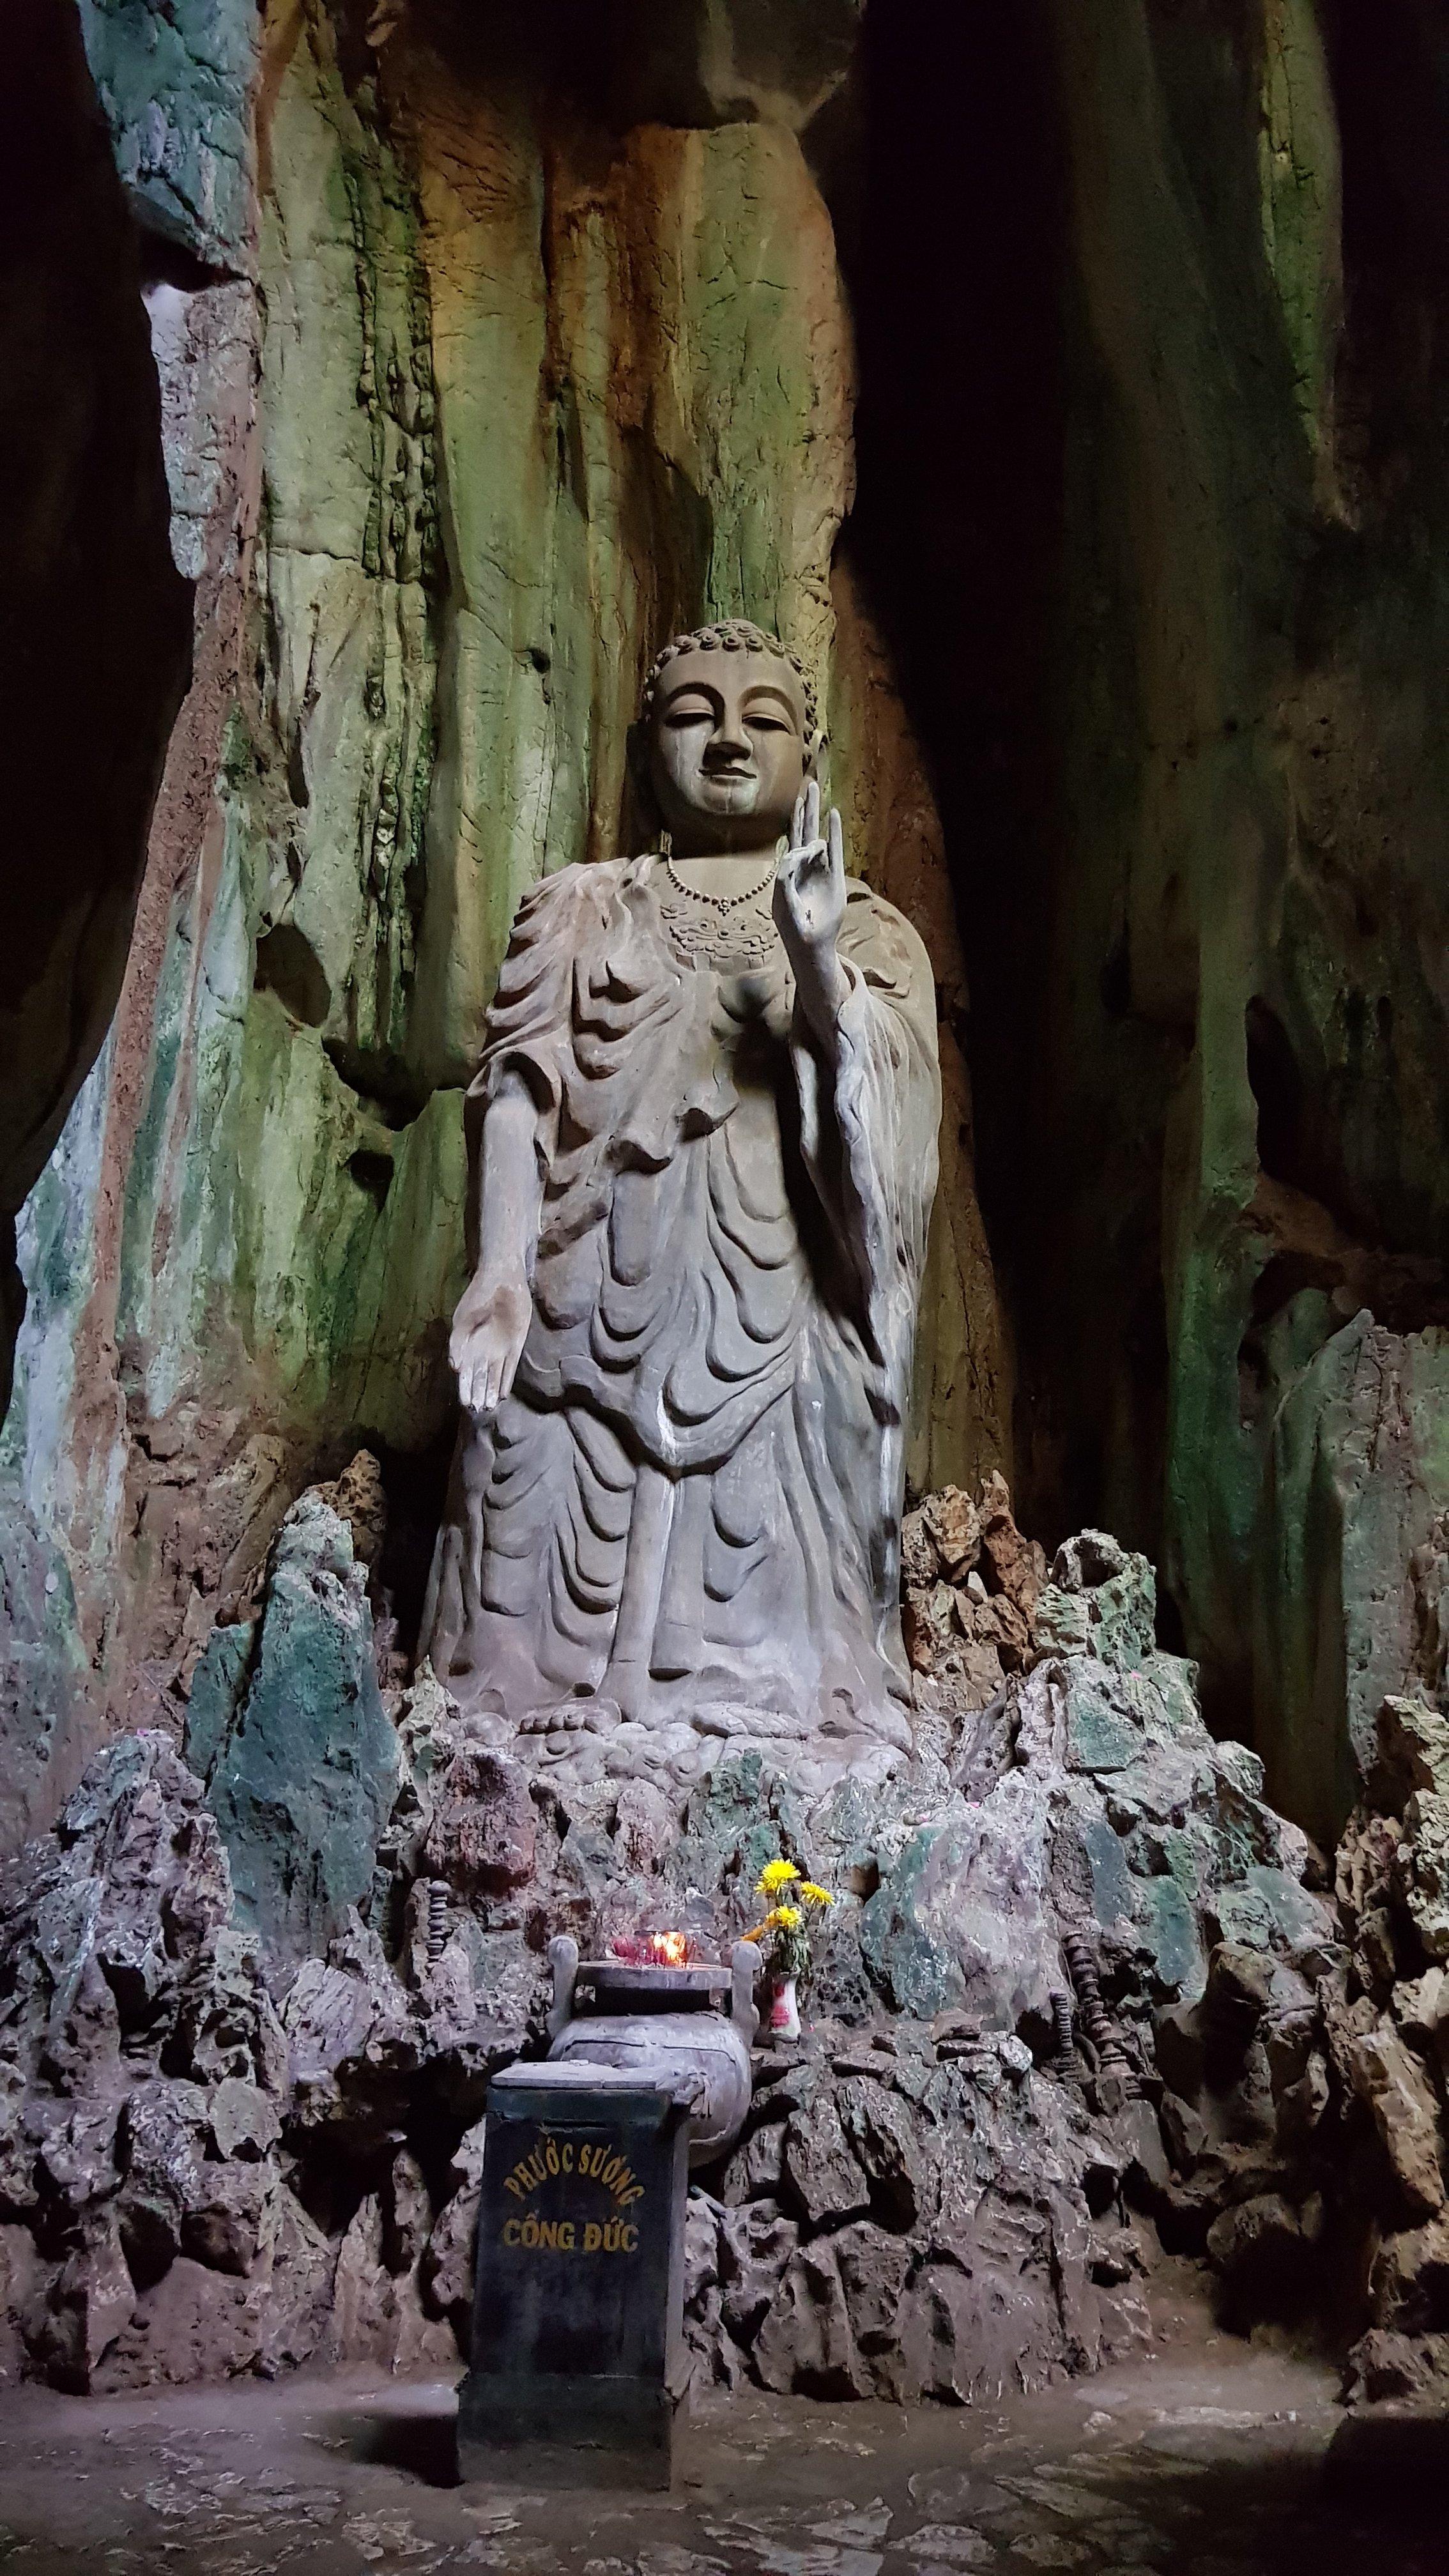 Hue to Da Nang: Buddha in Marble Mountain cave